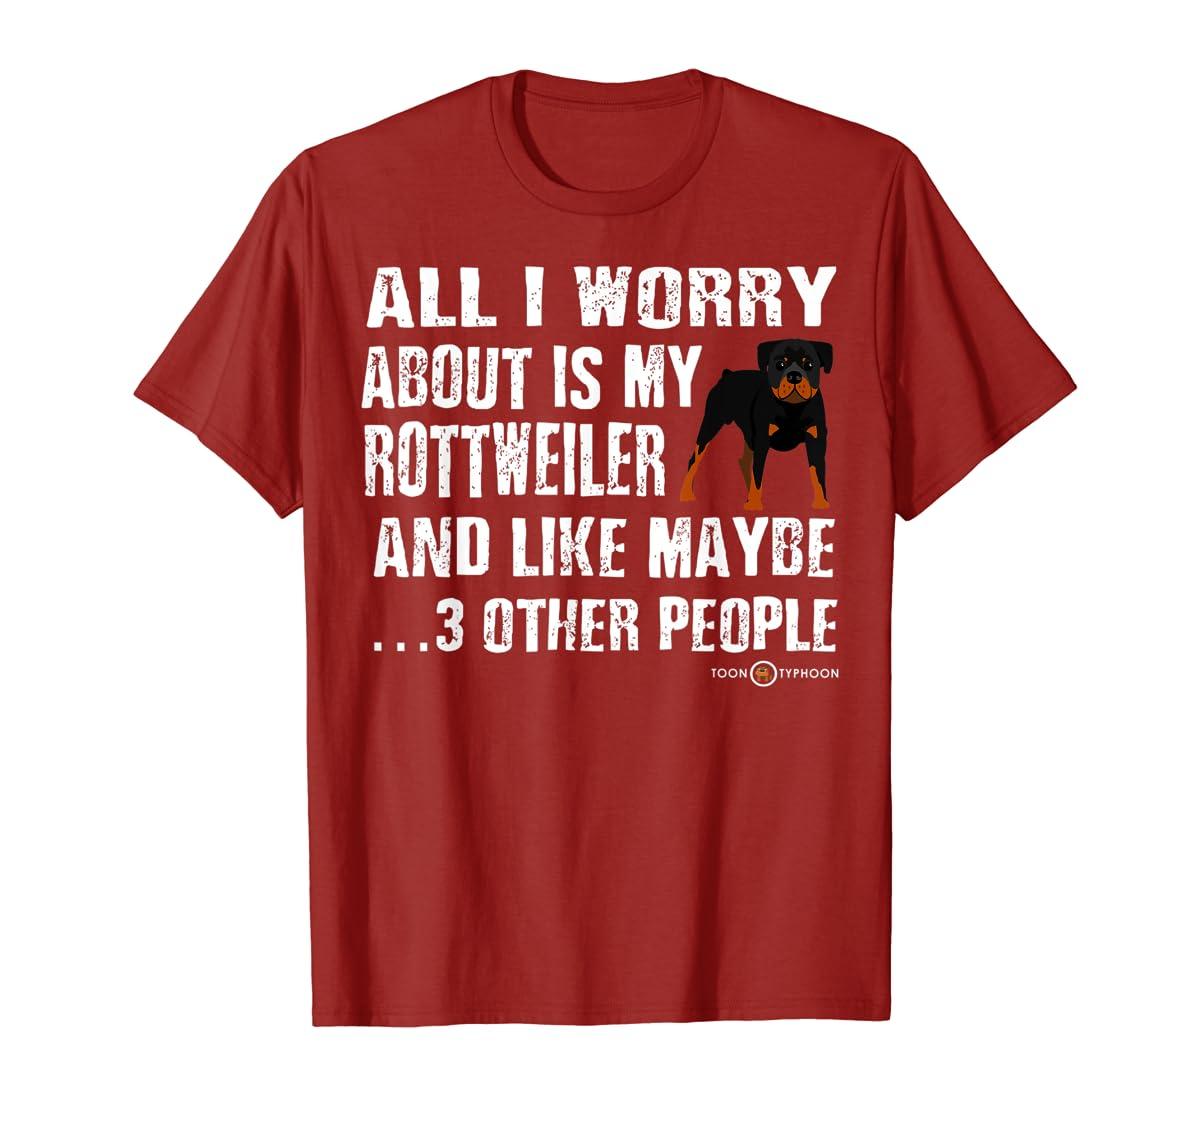 Rottweiler Shirt | All I worry about is my Rottweiler-Men's T-Shirt-Red